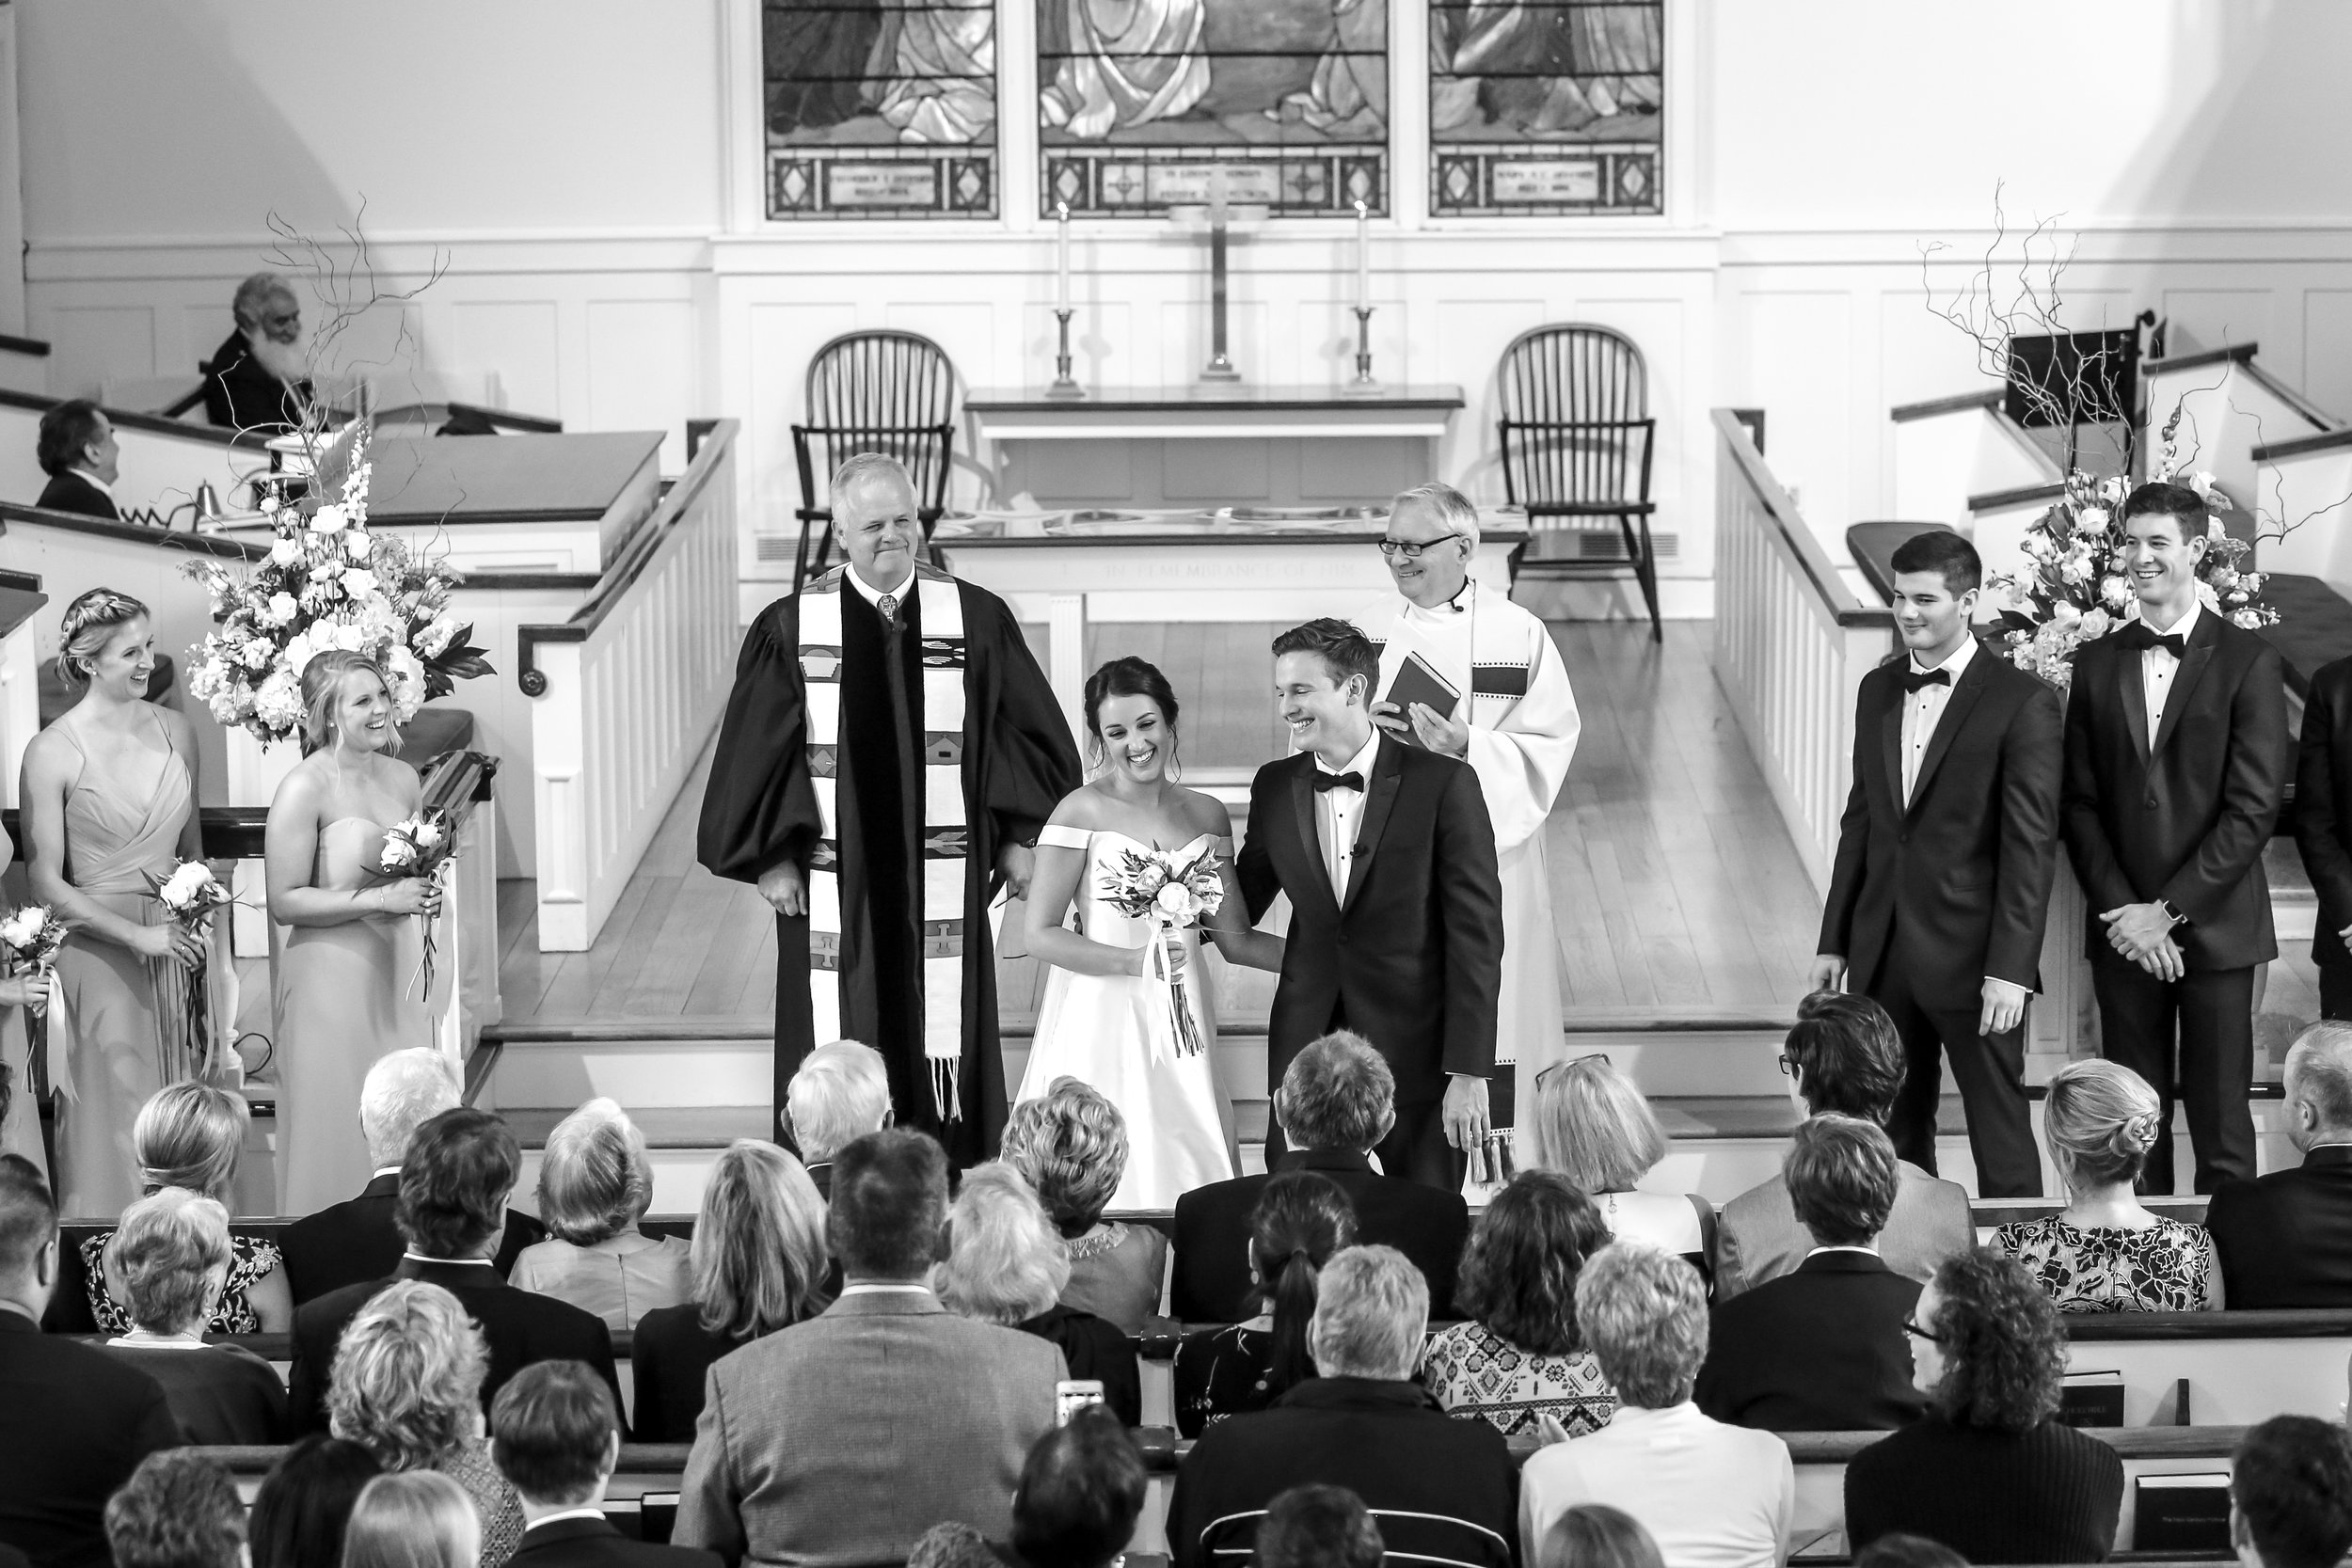 Jeremie_Barlow_Photography_Steffen_Sudyam_wedding_2018-464.jpg